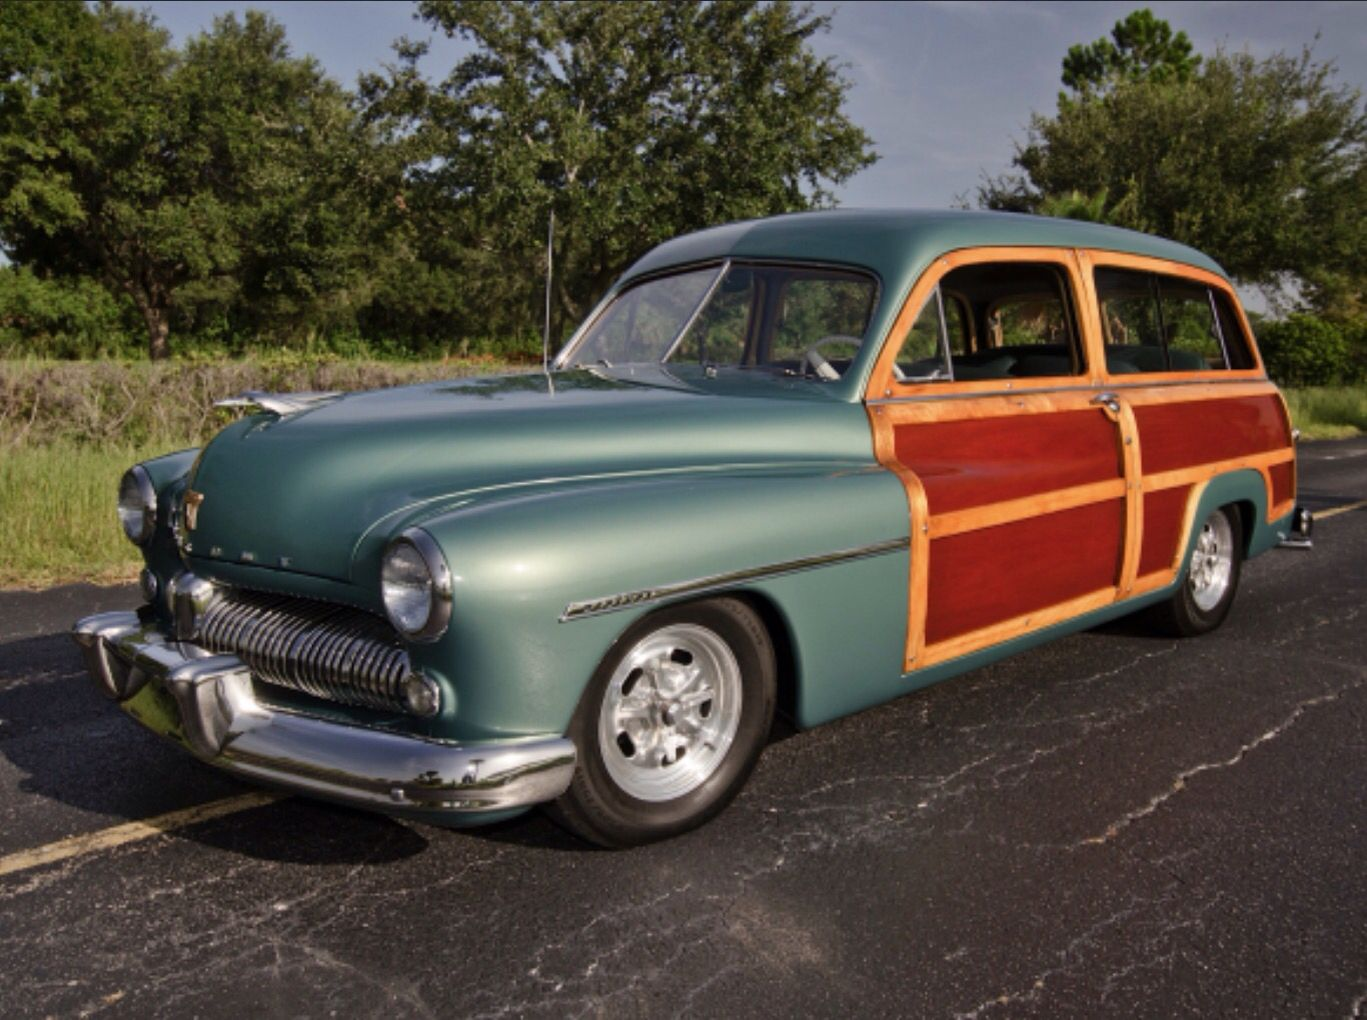 mercury wood station wagon car 1949 cars from mercury. Black Bedroom Furniture Sets. Home Design Ideas